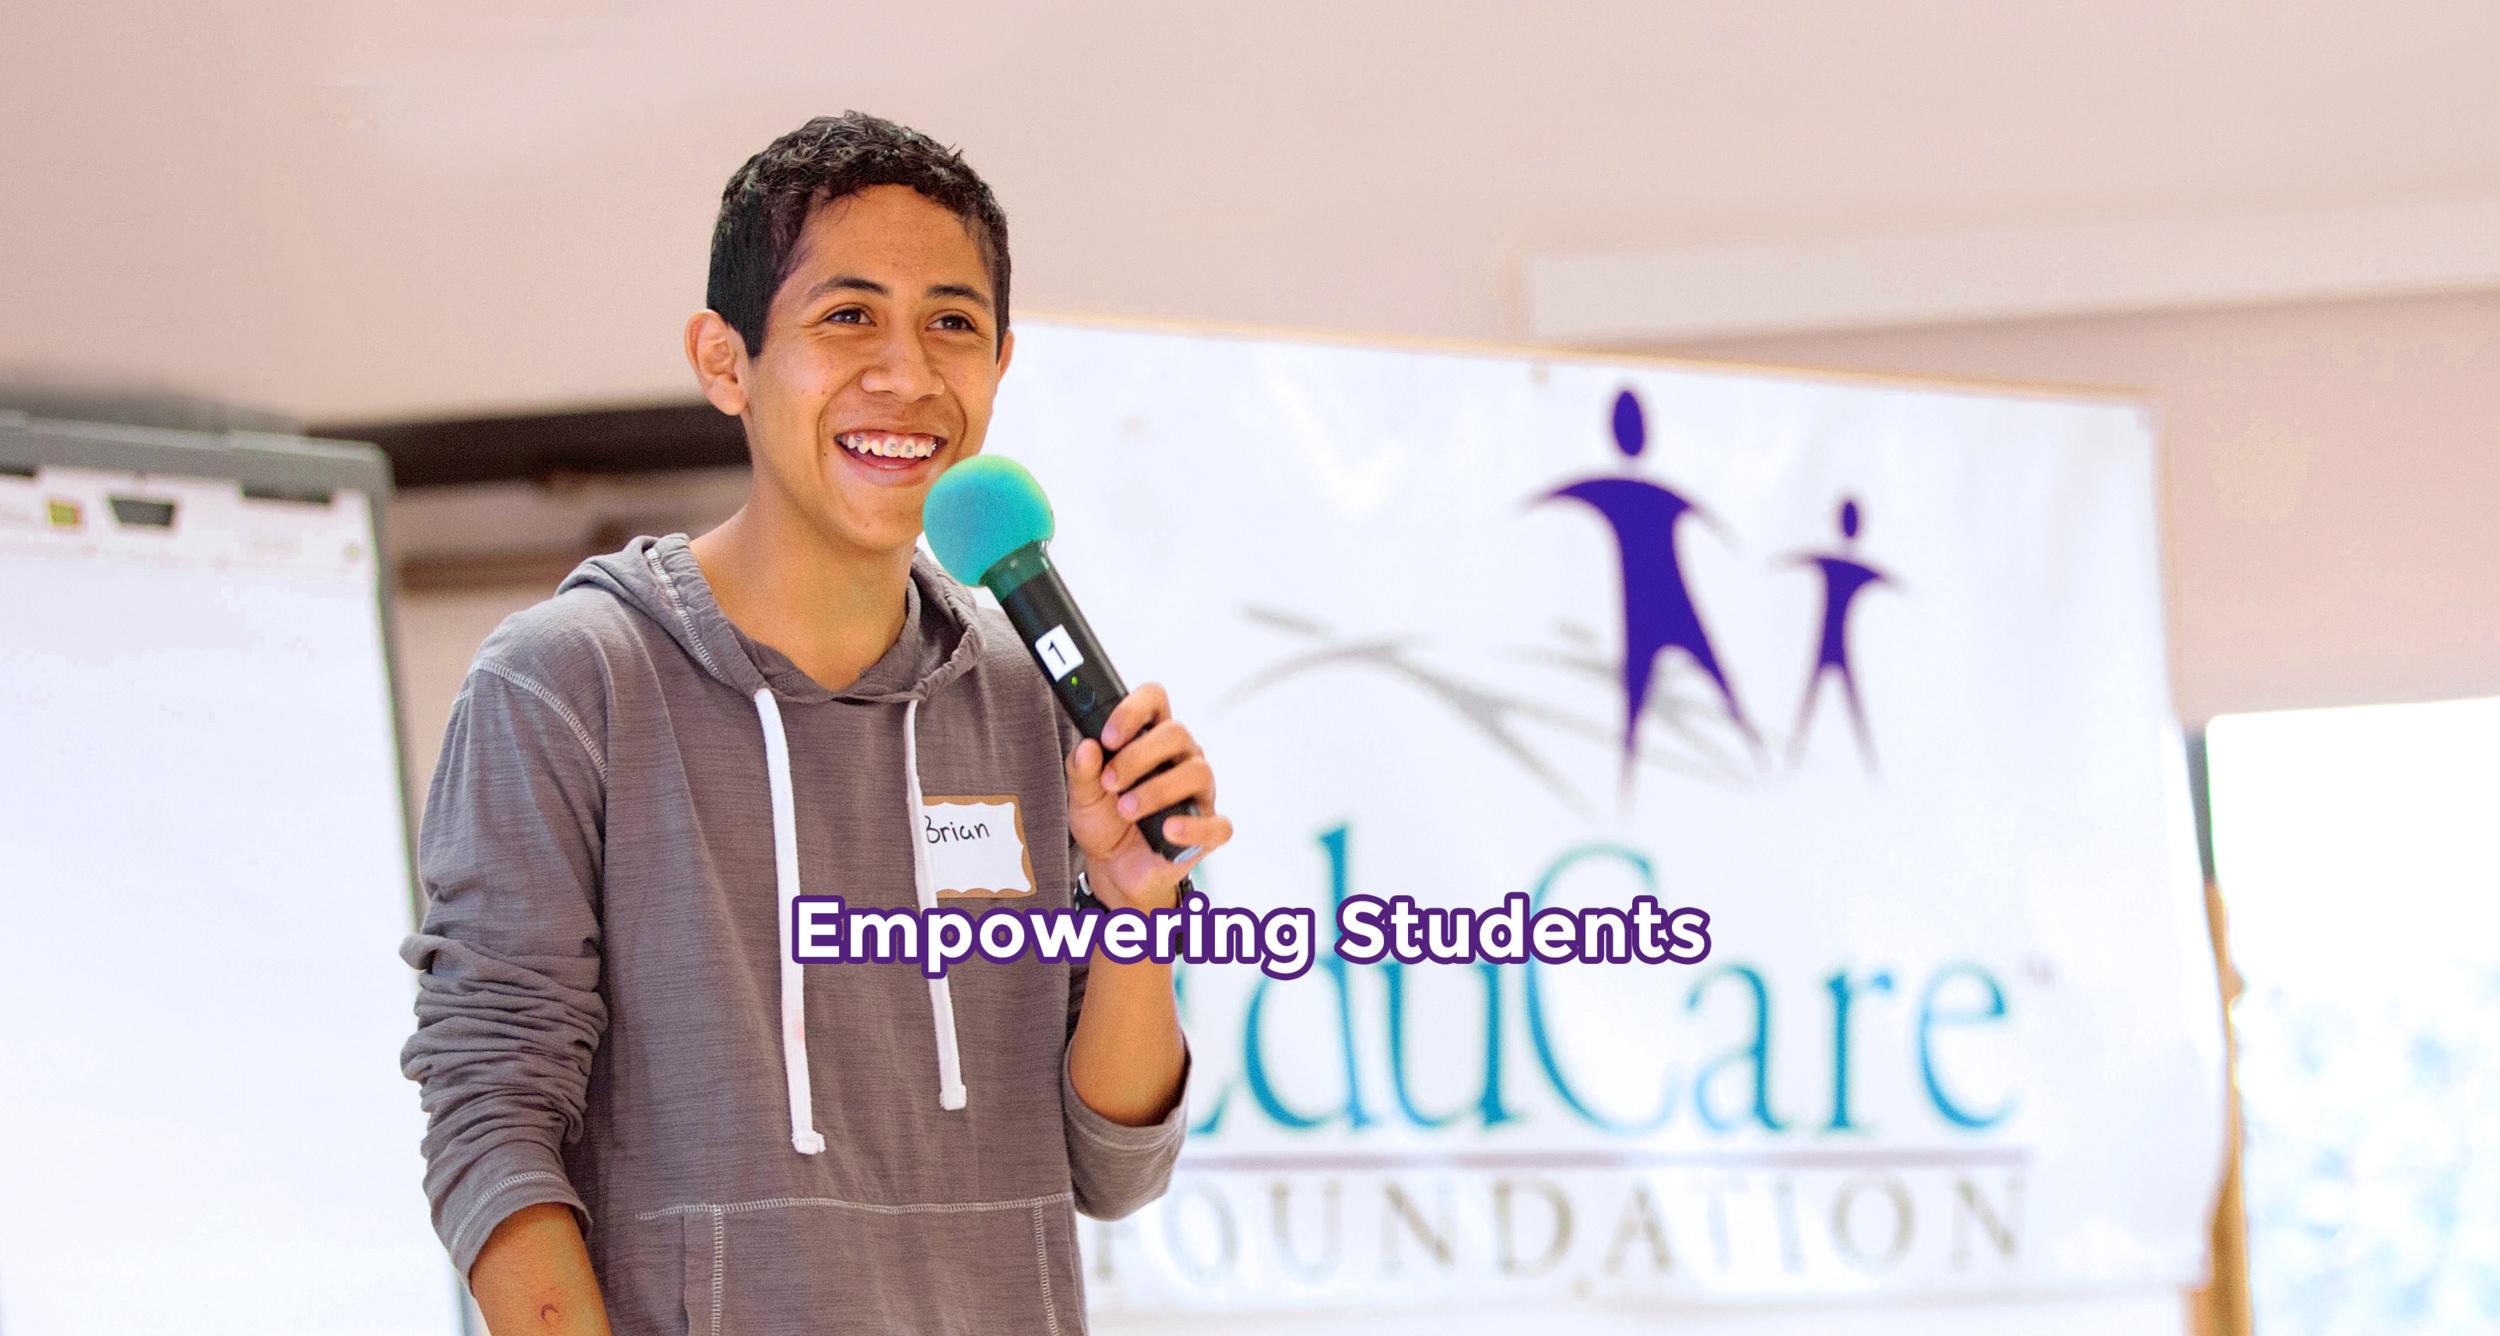 CA6_Empowering Students Website Photo Slider 1 - Version 3.png